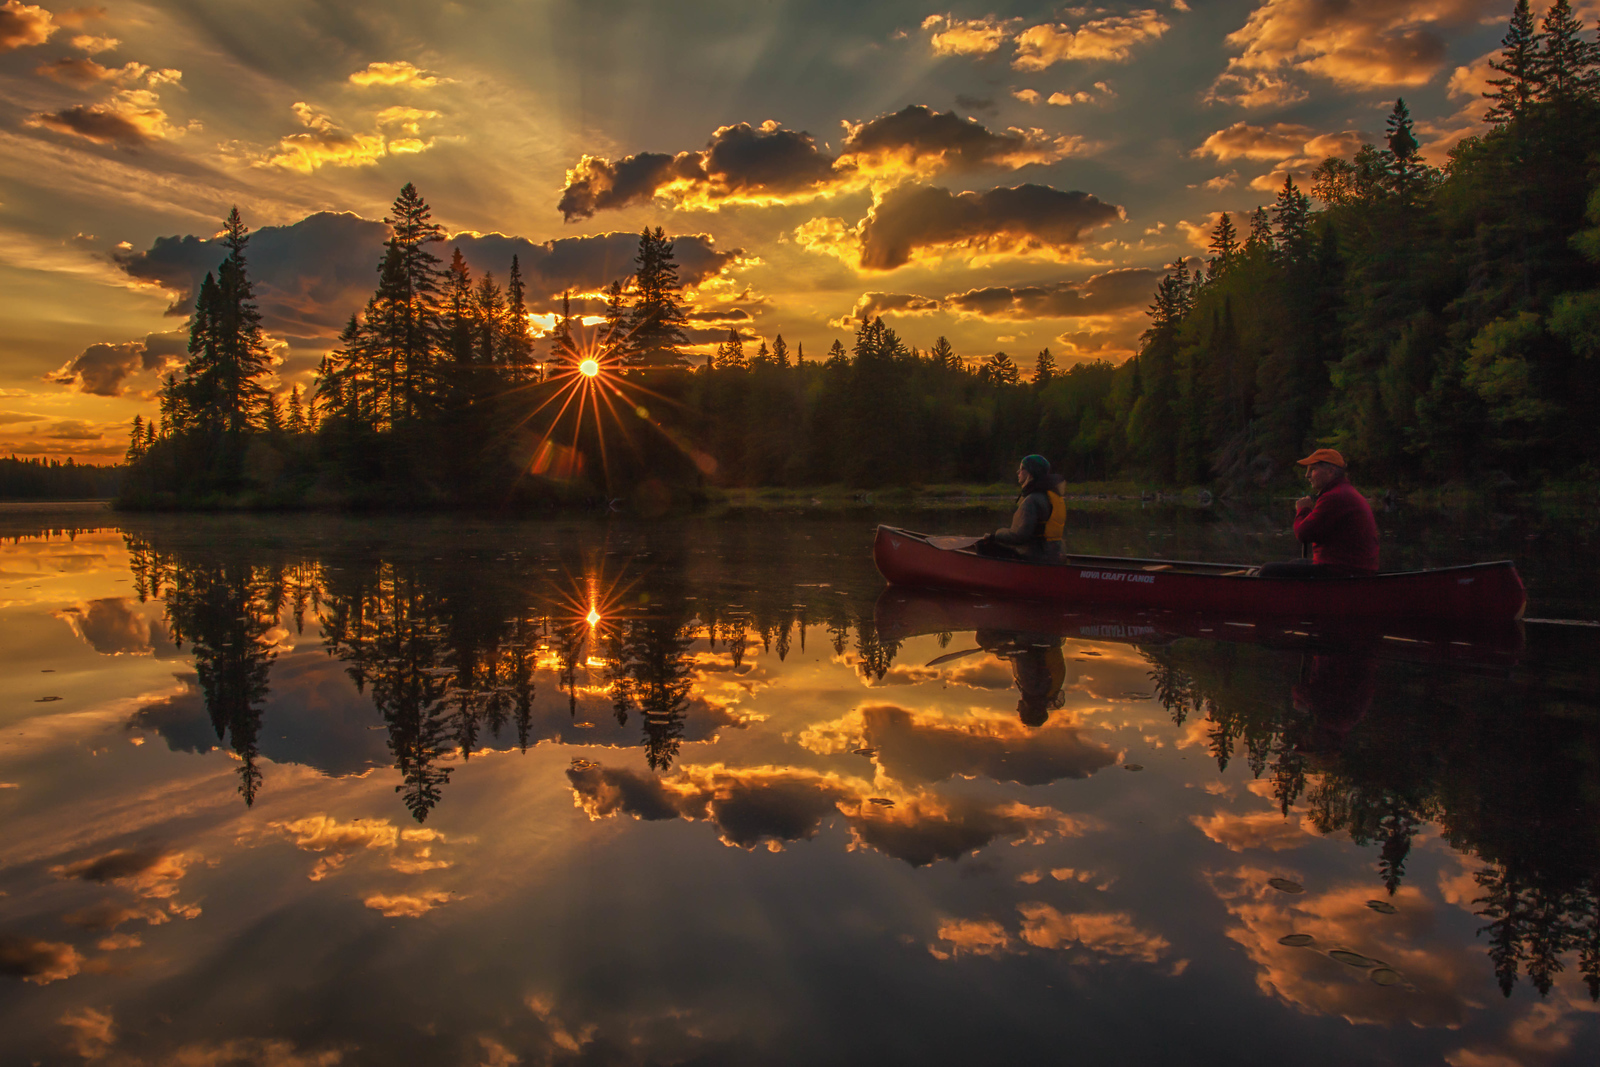 A sunrise paddle in Algonquin Park